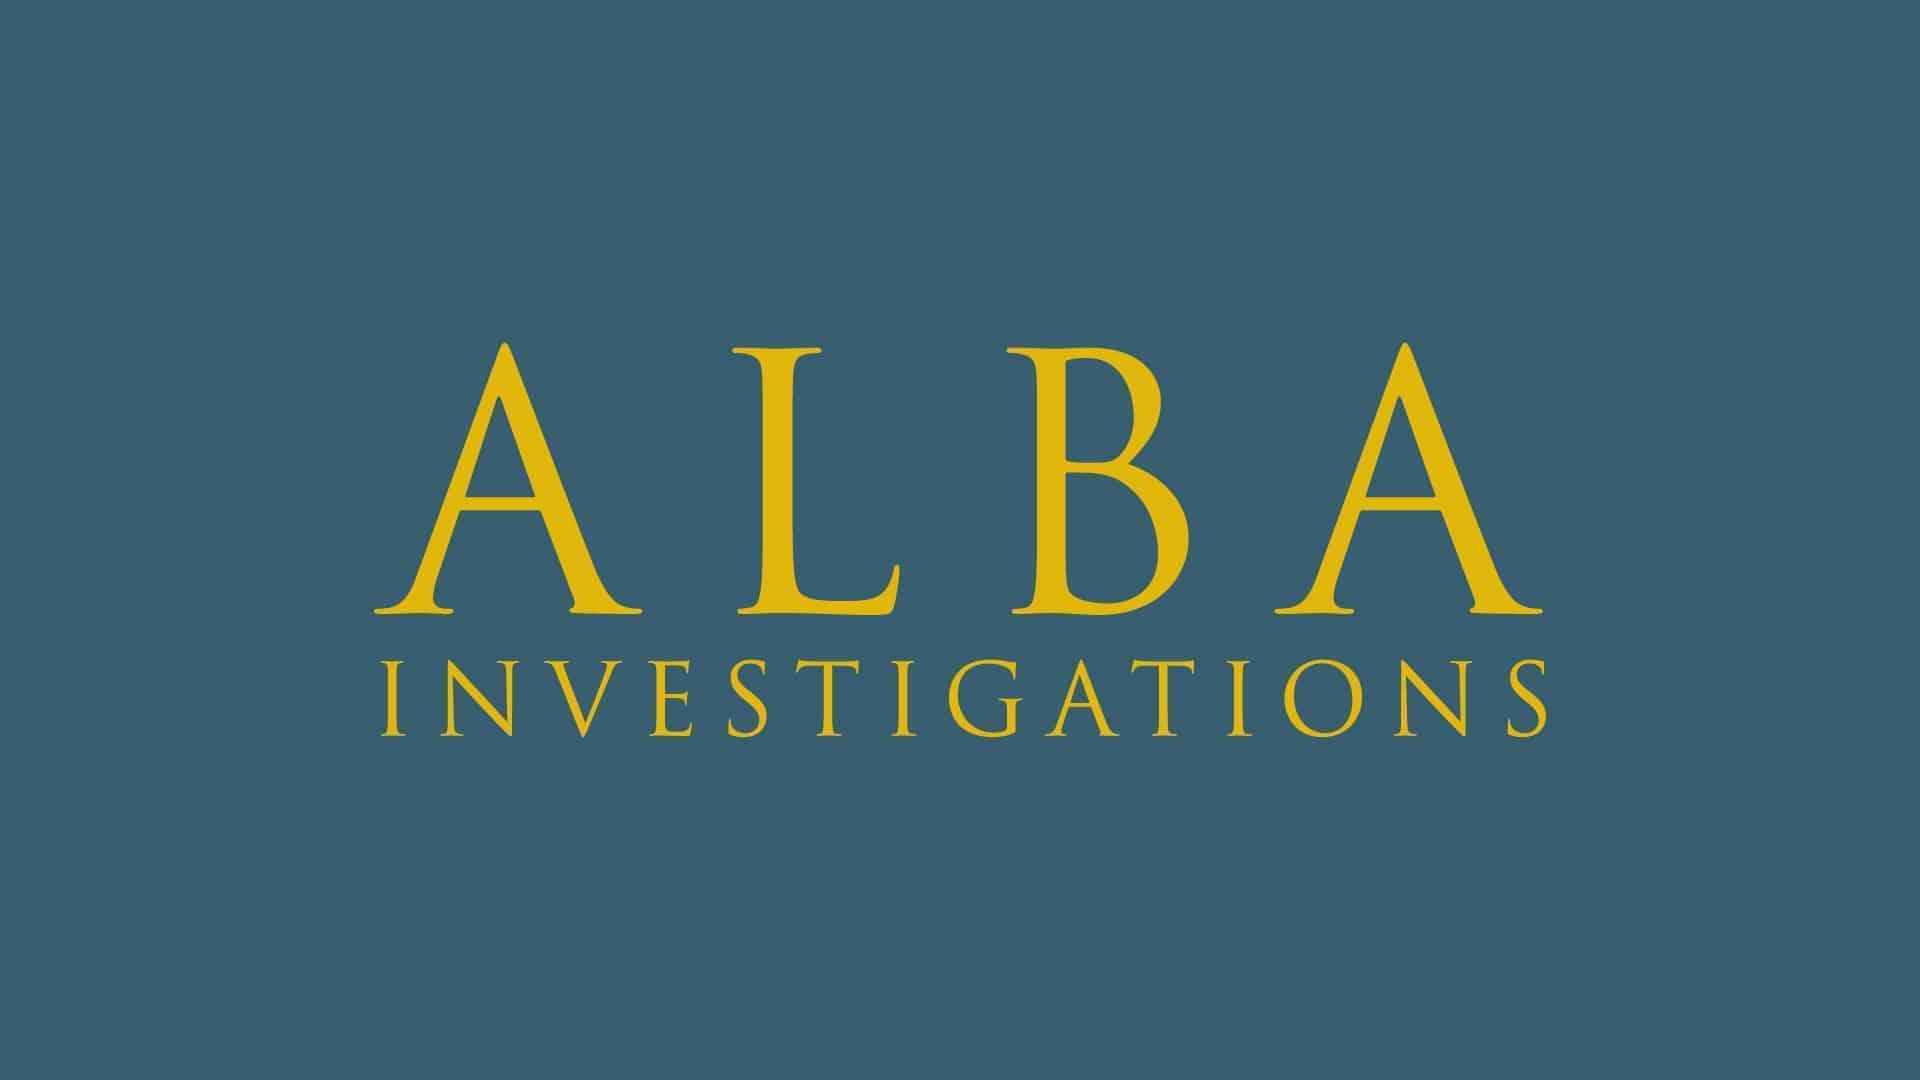 alba investigations logo